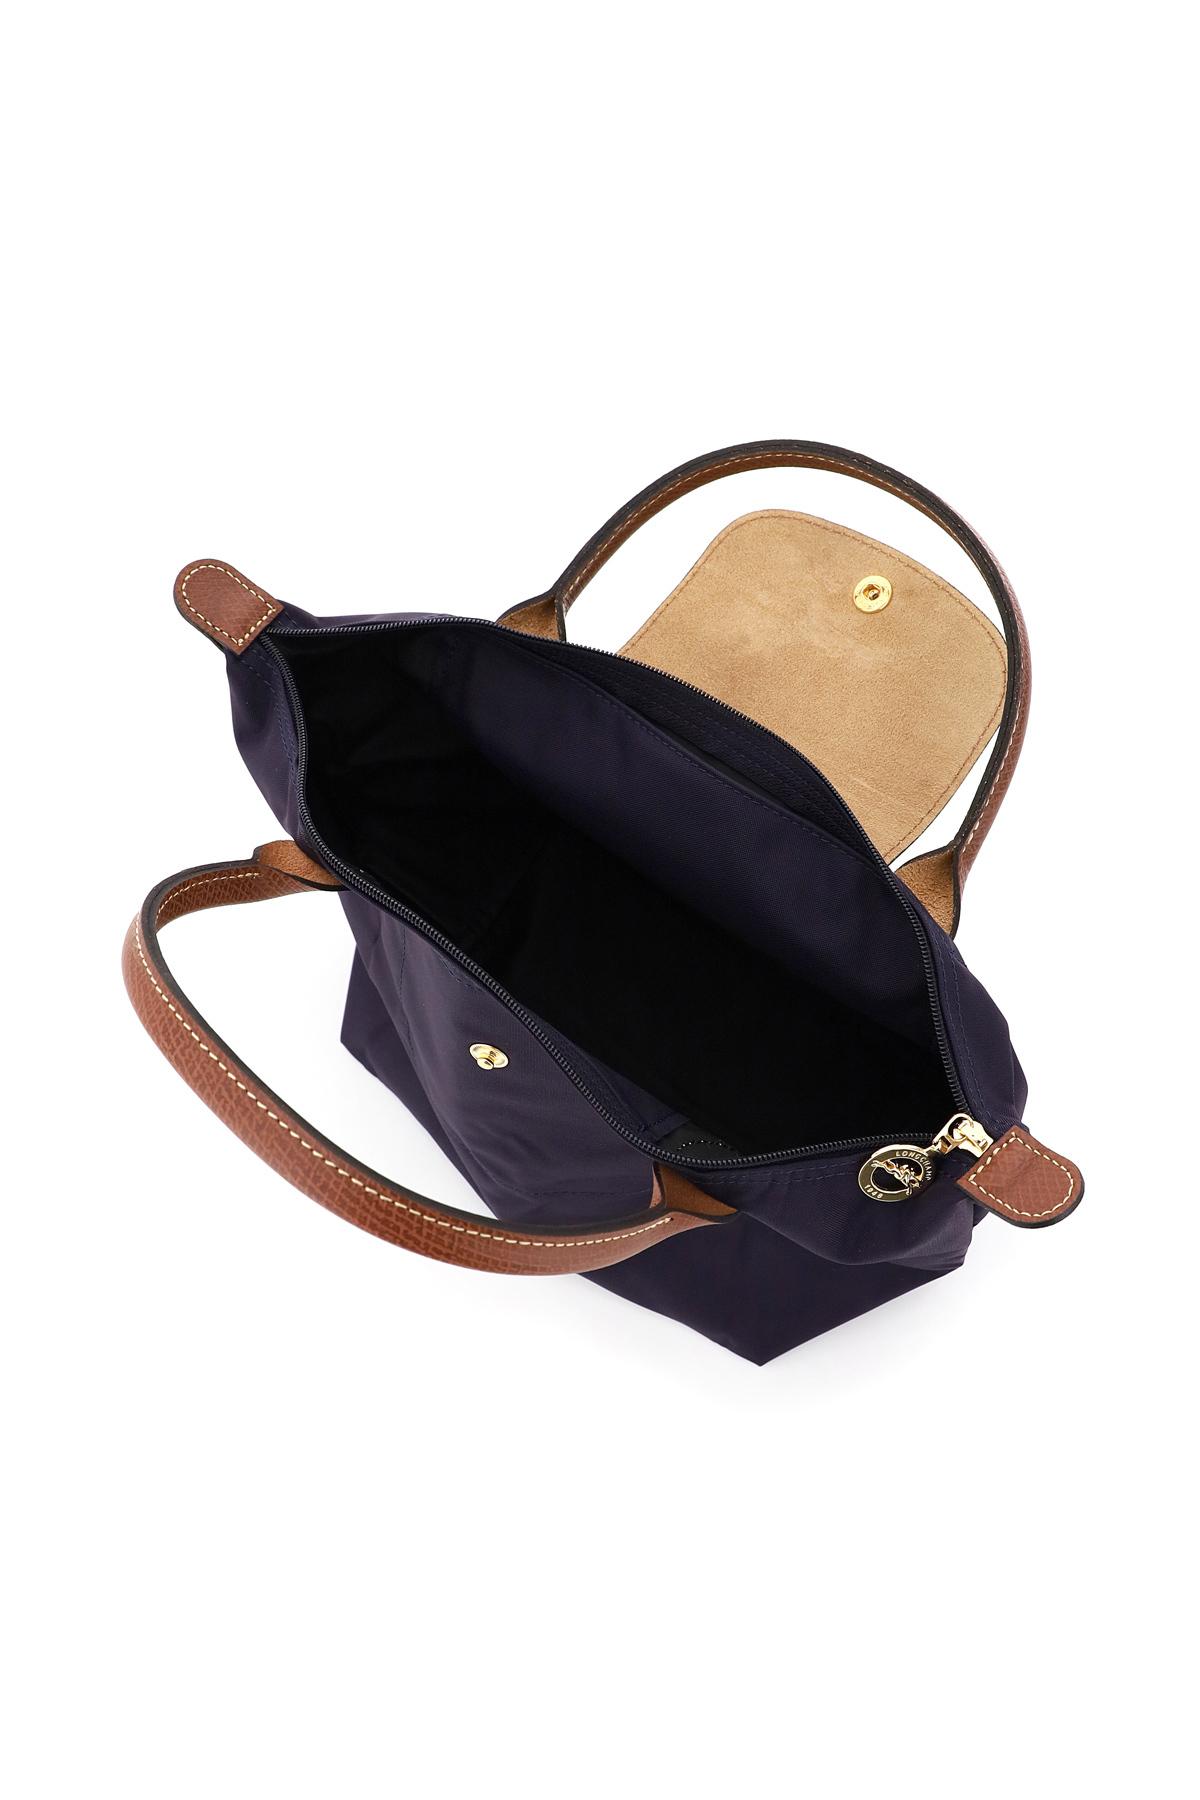 Longchamp borsa a mano le pliage small